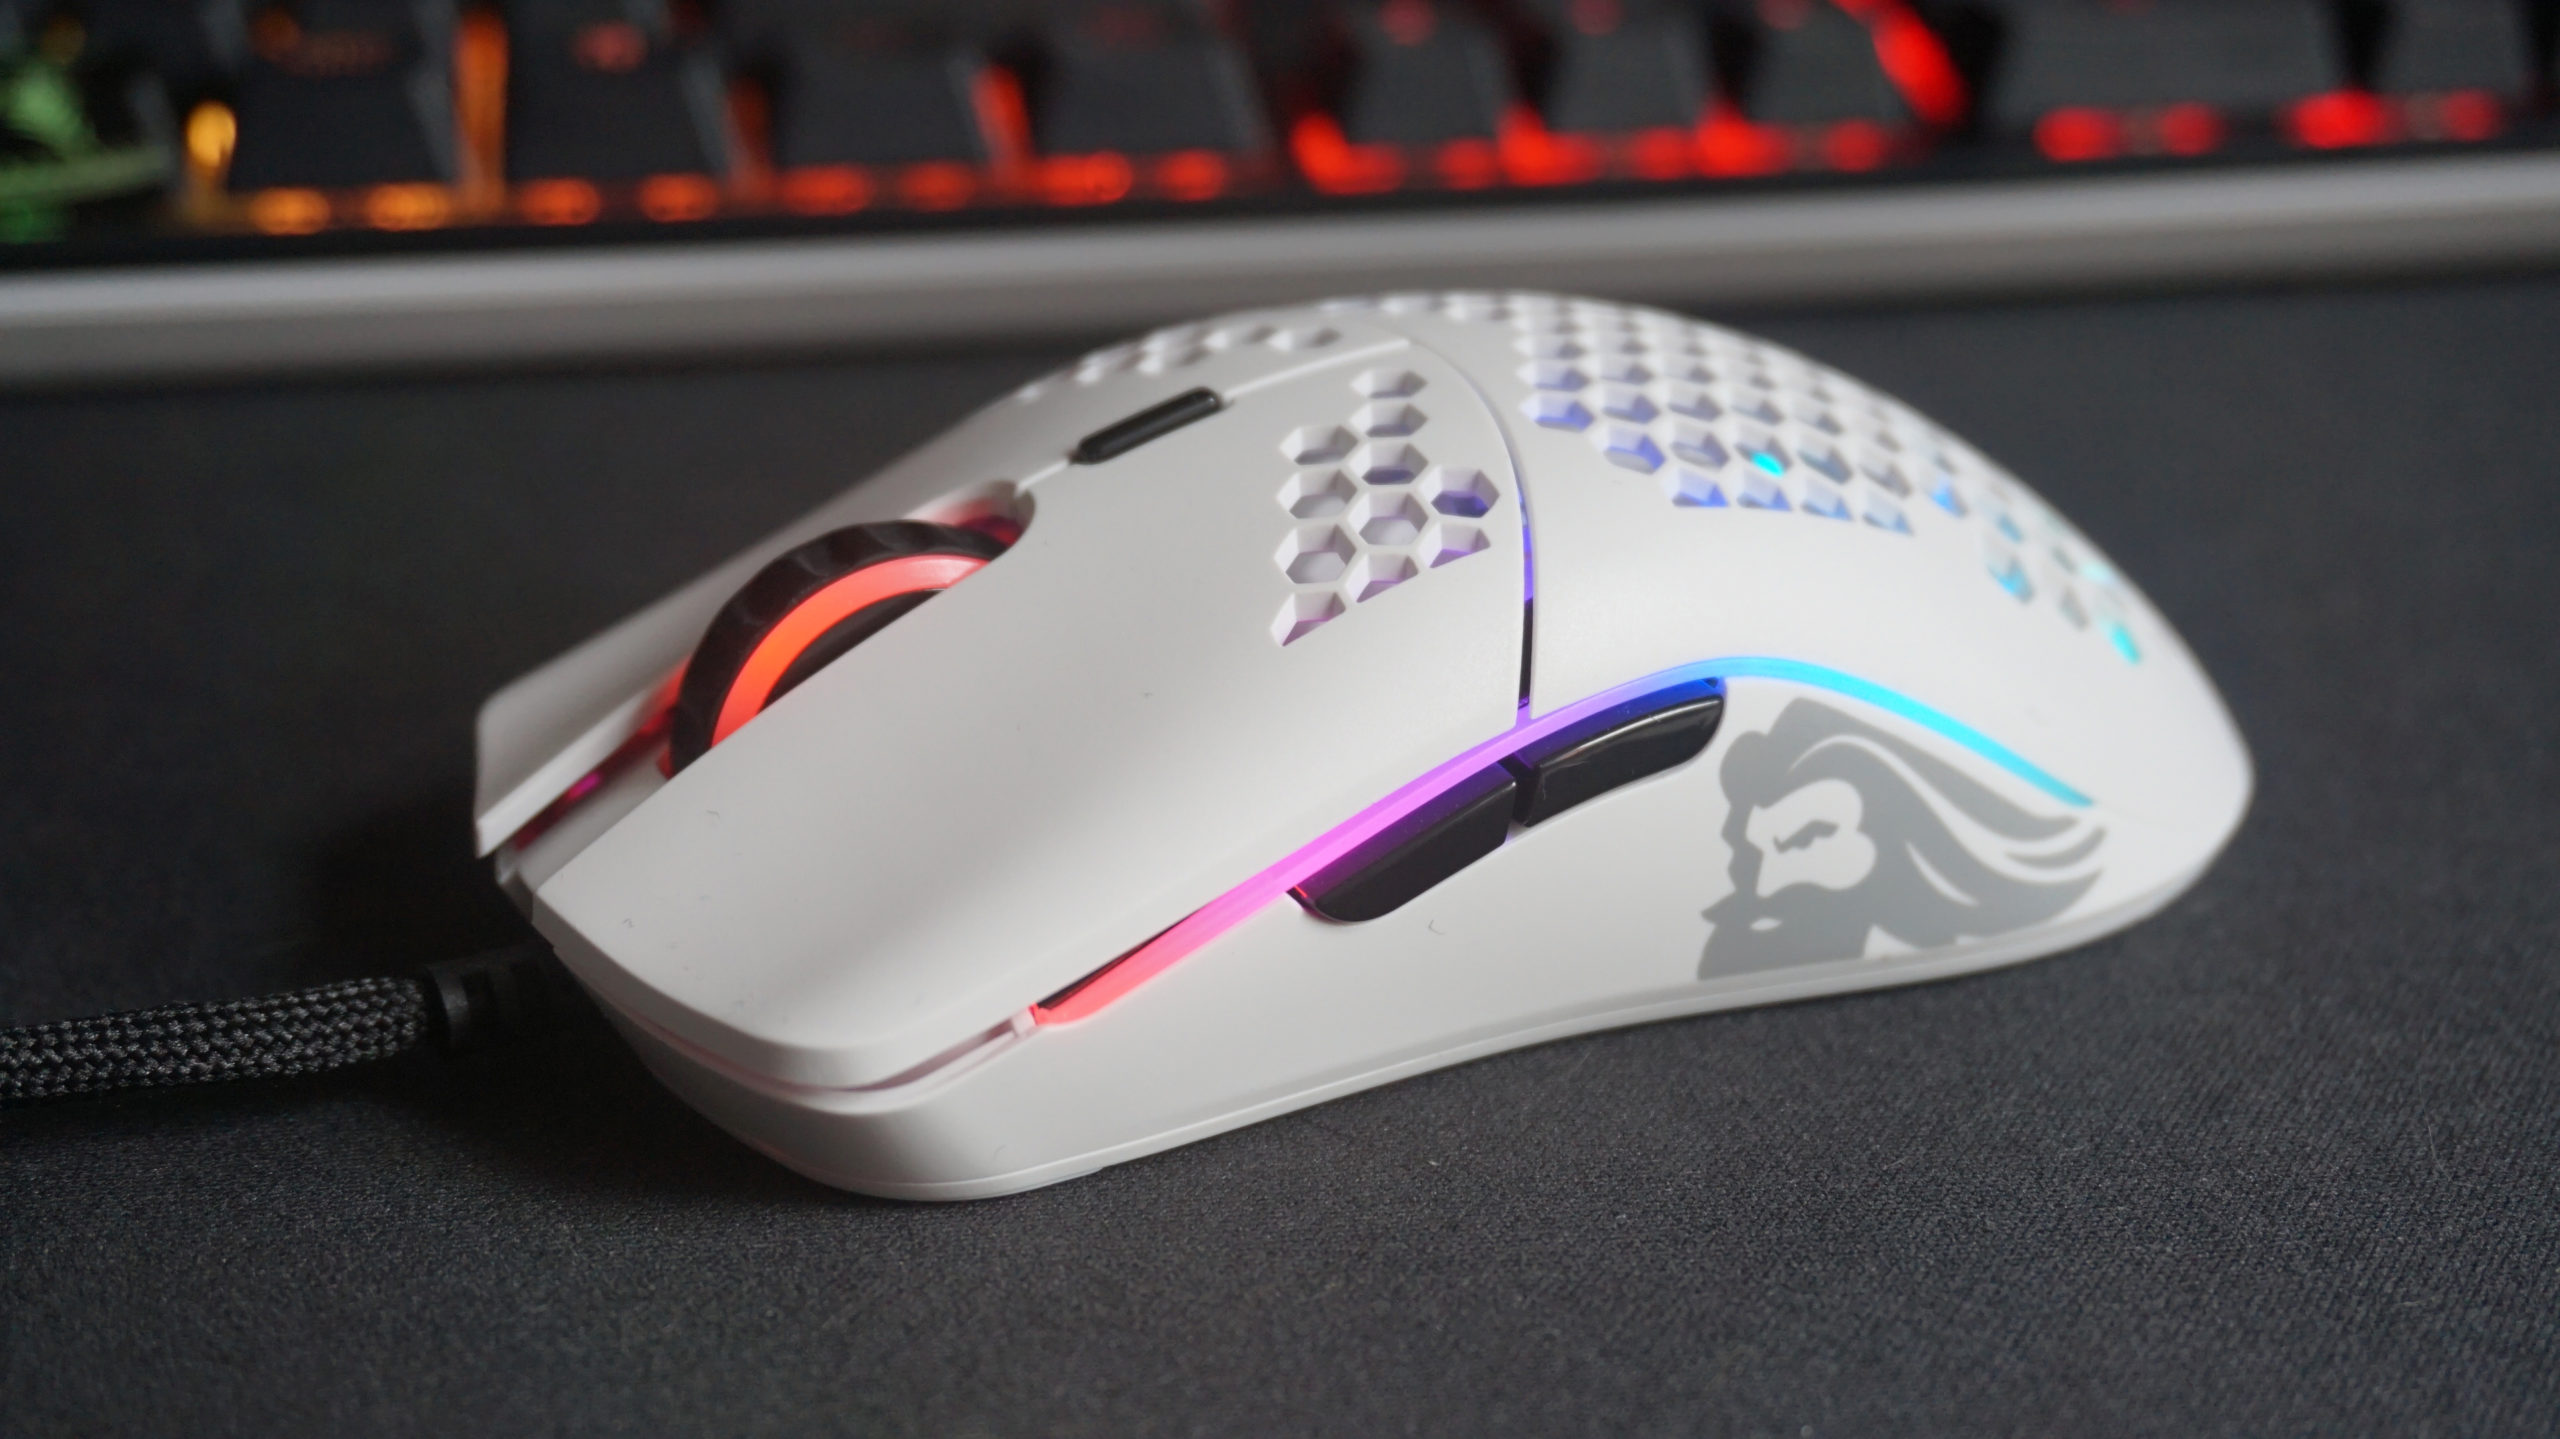 Glorious Model O: miglior mouse gaming ultraleggero